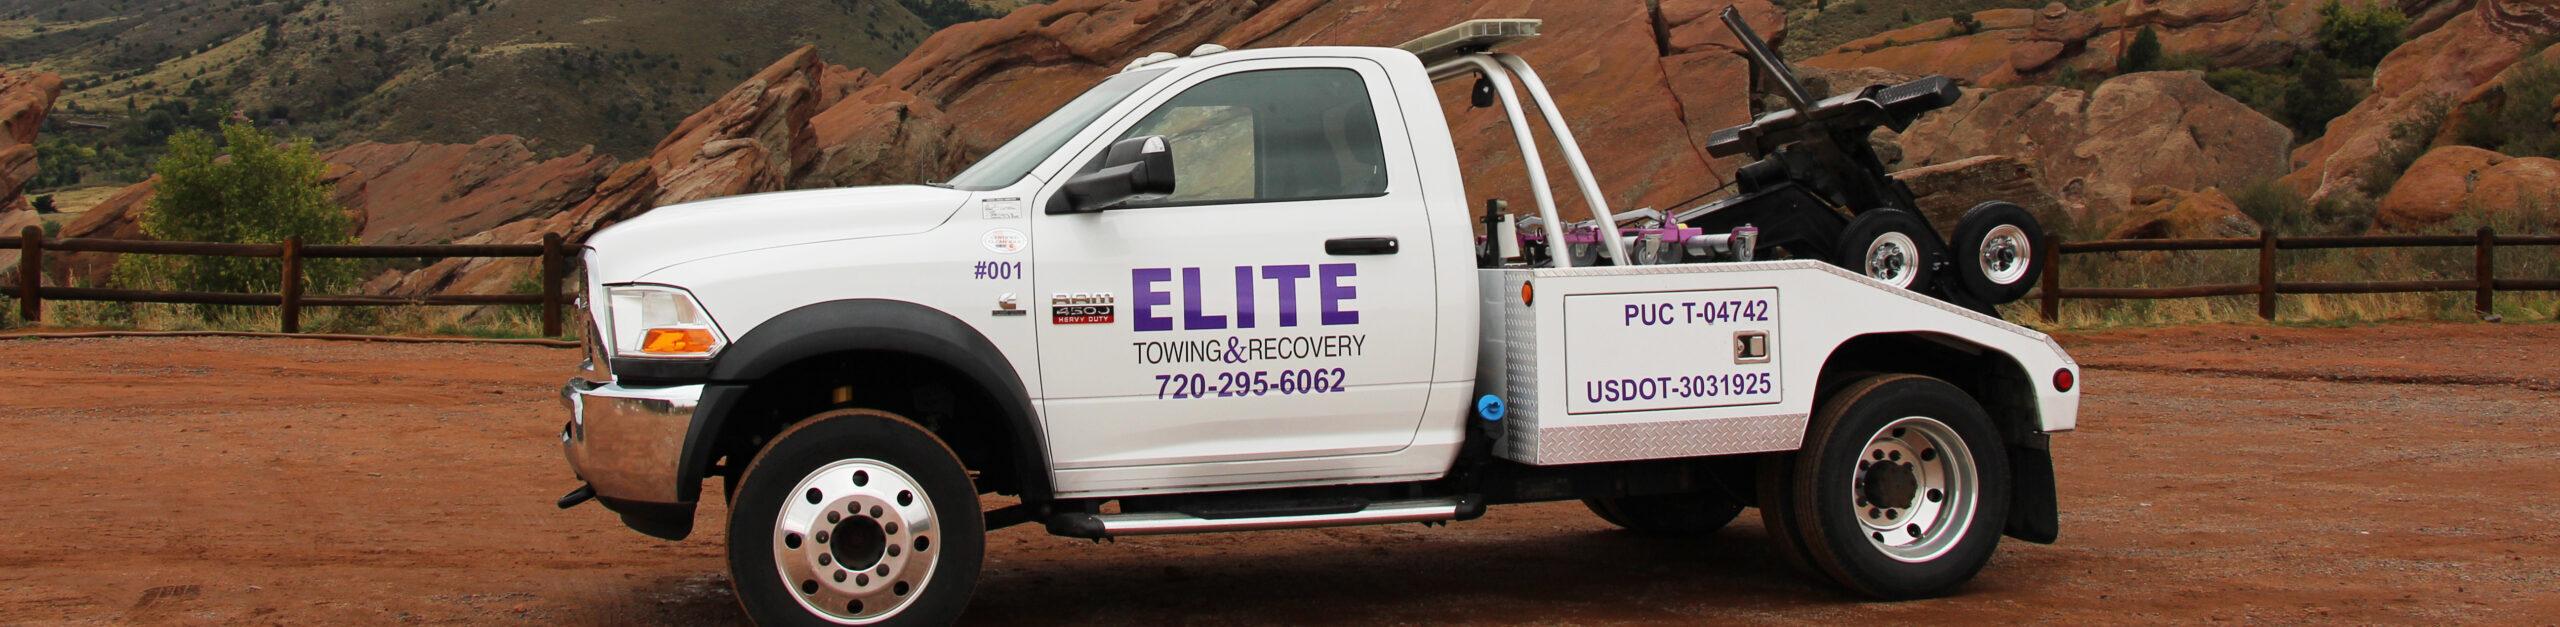 Elite Towing Denver logo